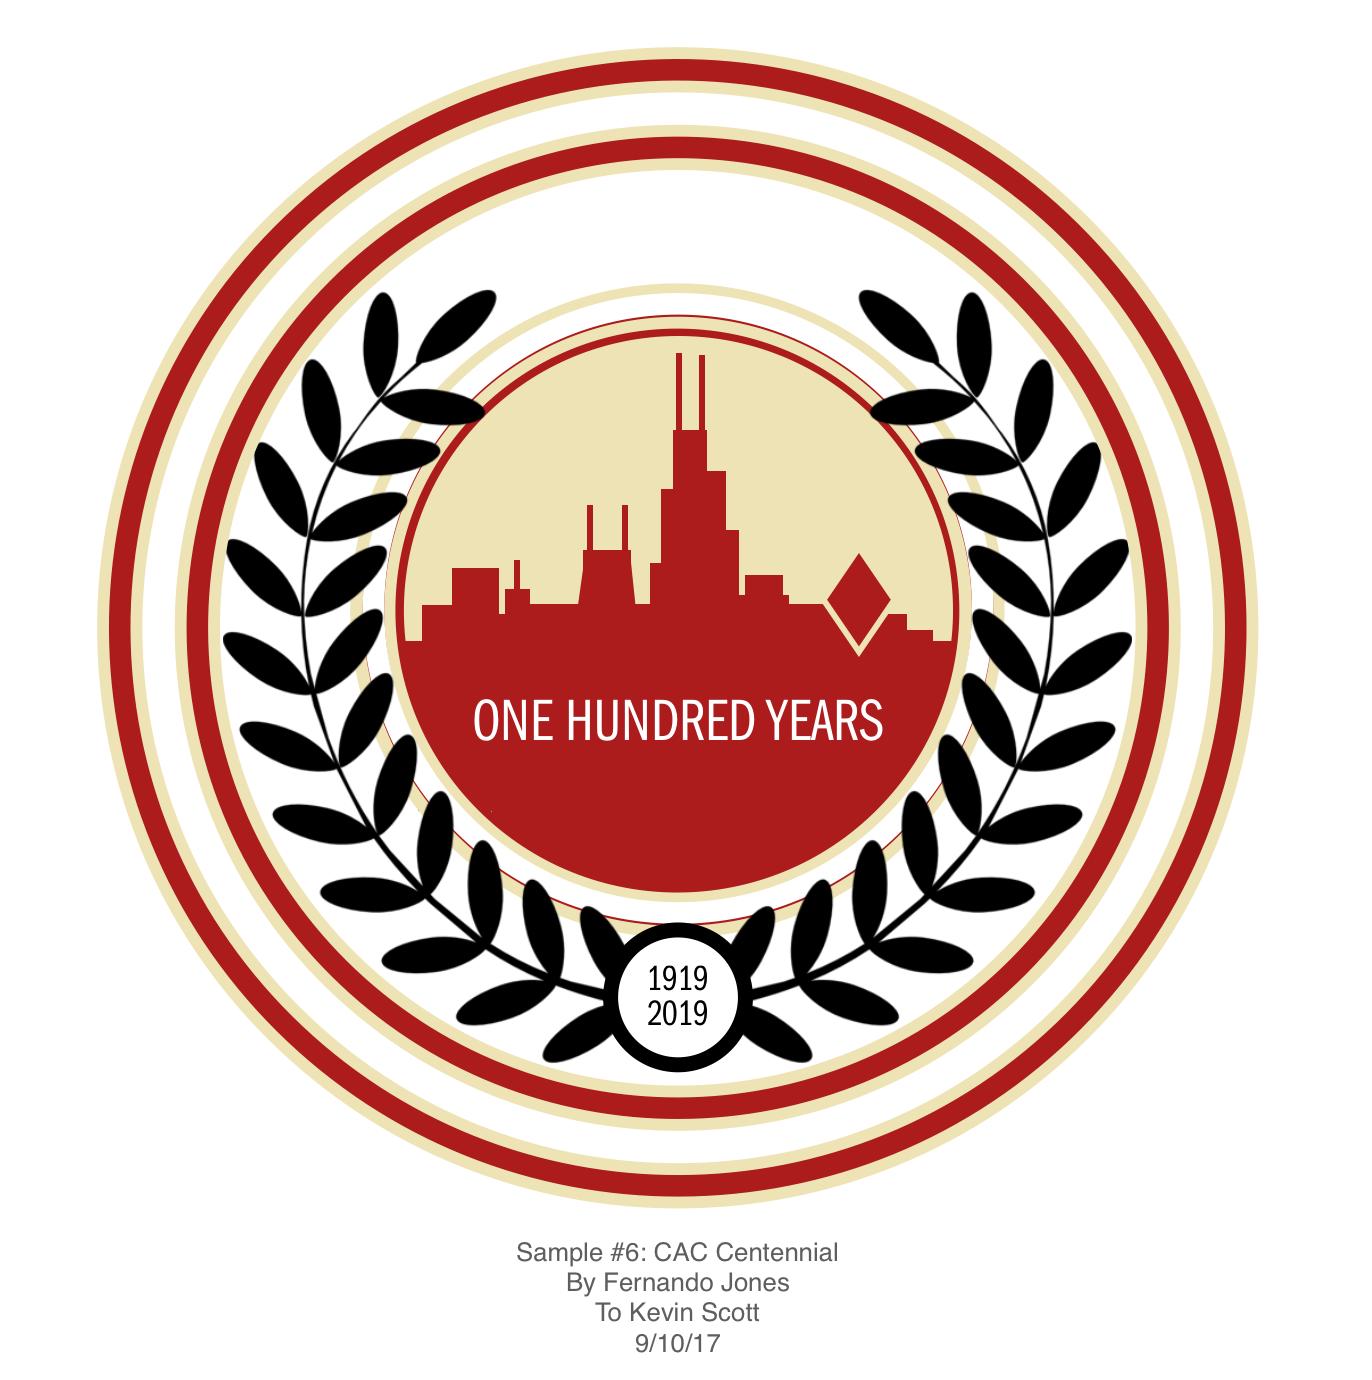 CAC Centennial